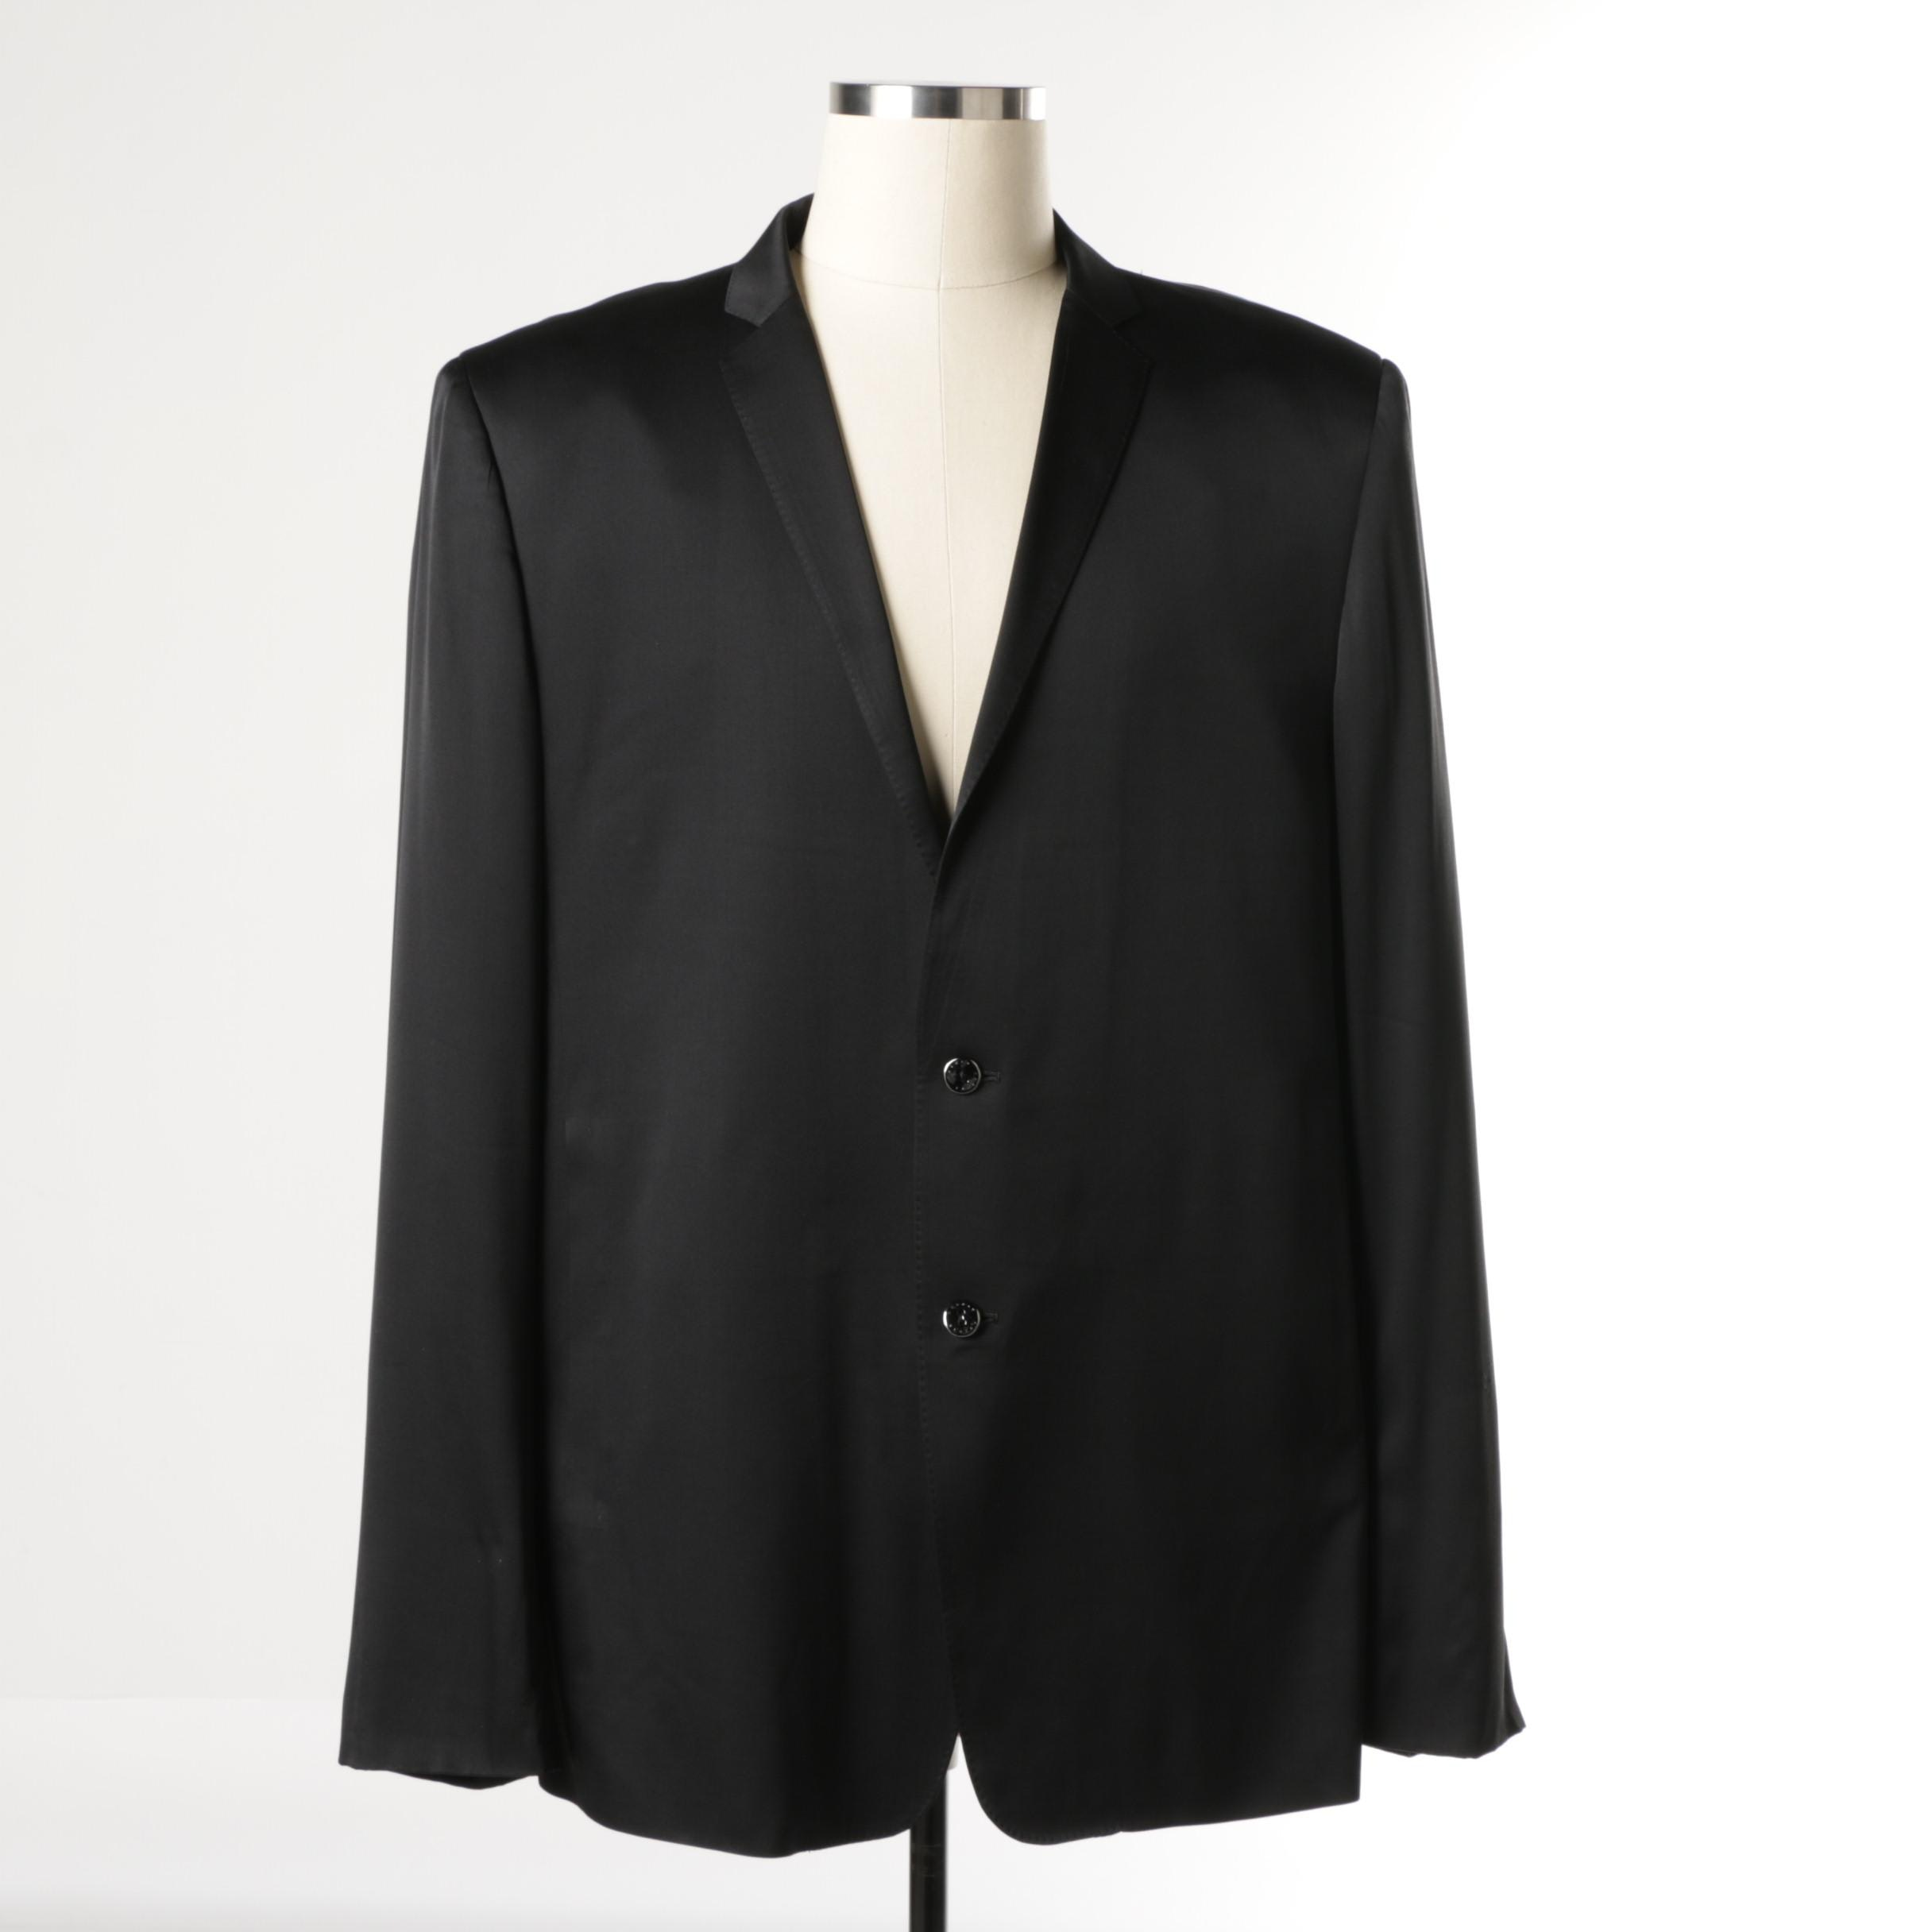 Men's Masatomo Black Silk Blend Suit Jacket